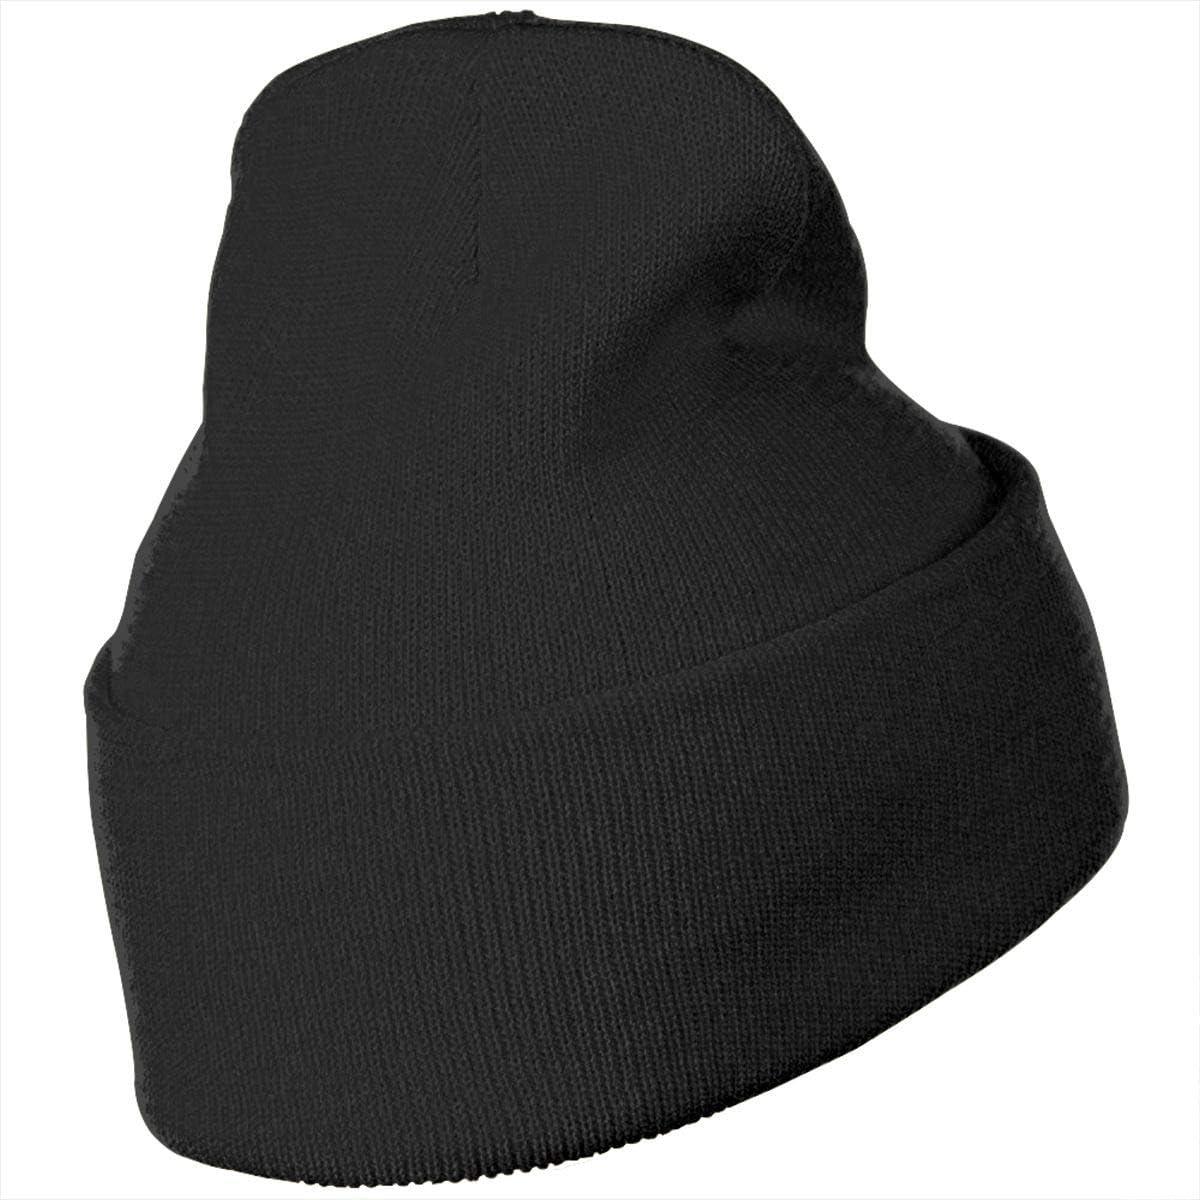 Rabbit Winter Wool Cap Warm Beanies Knitted Hat